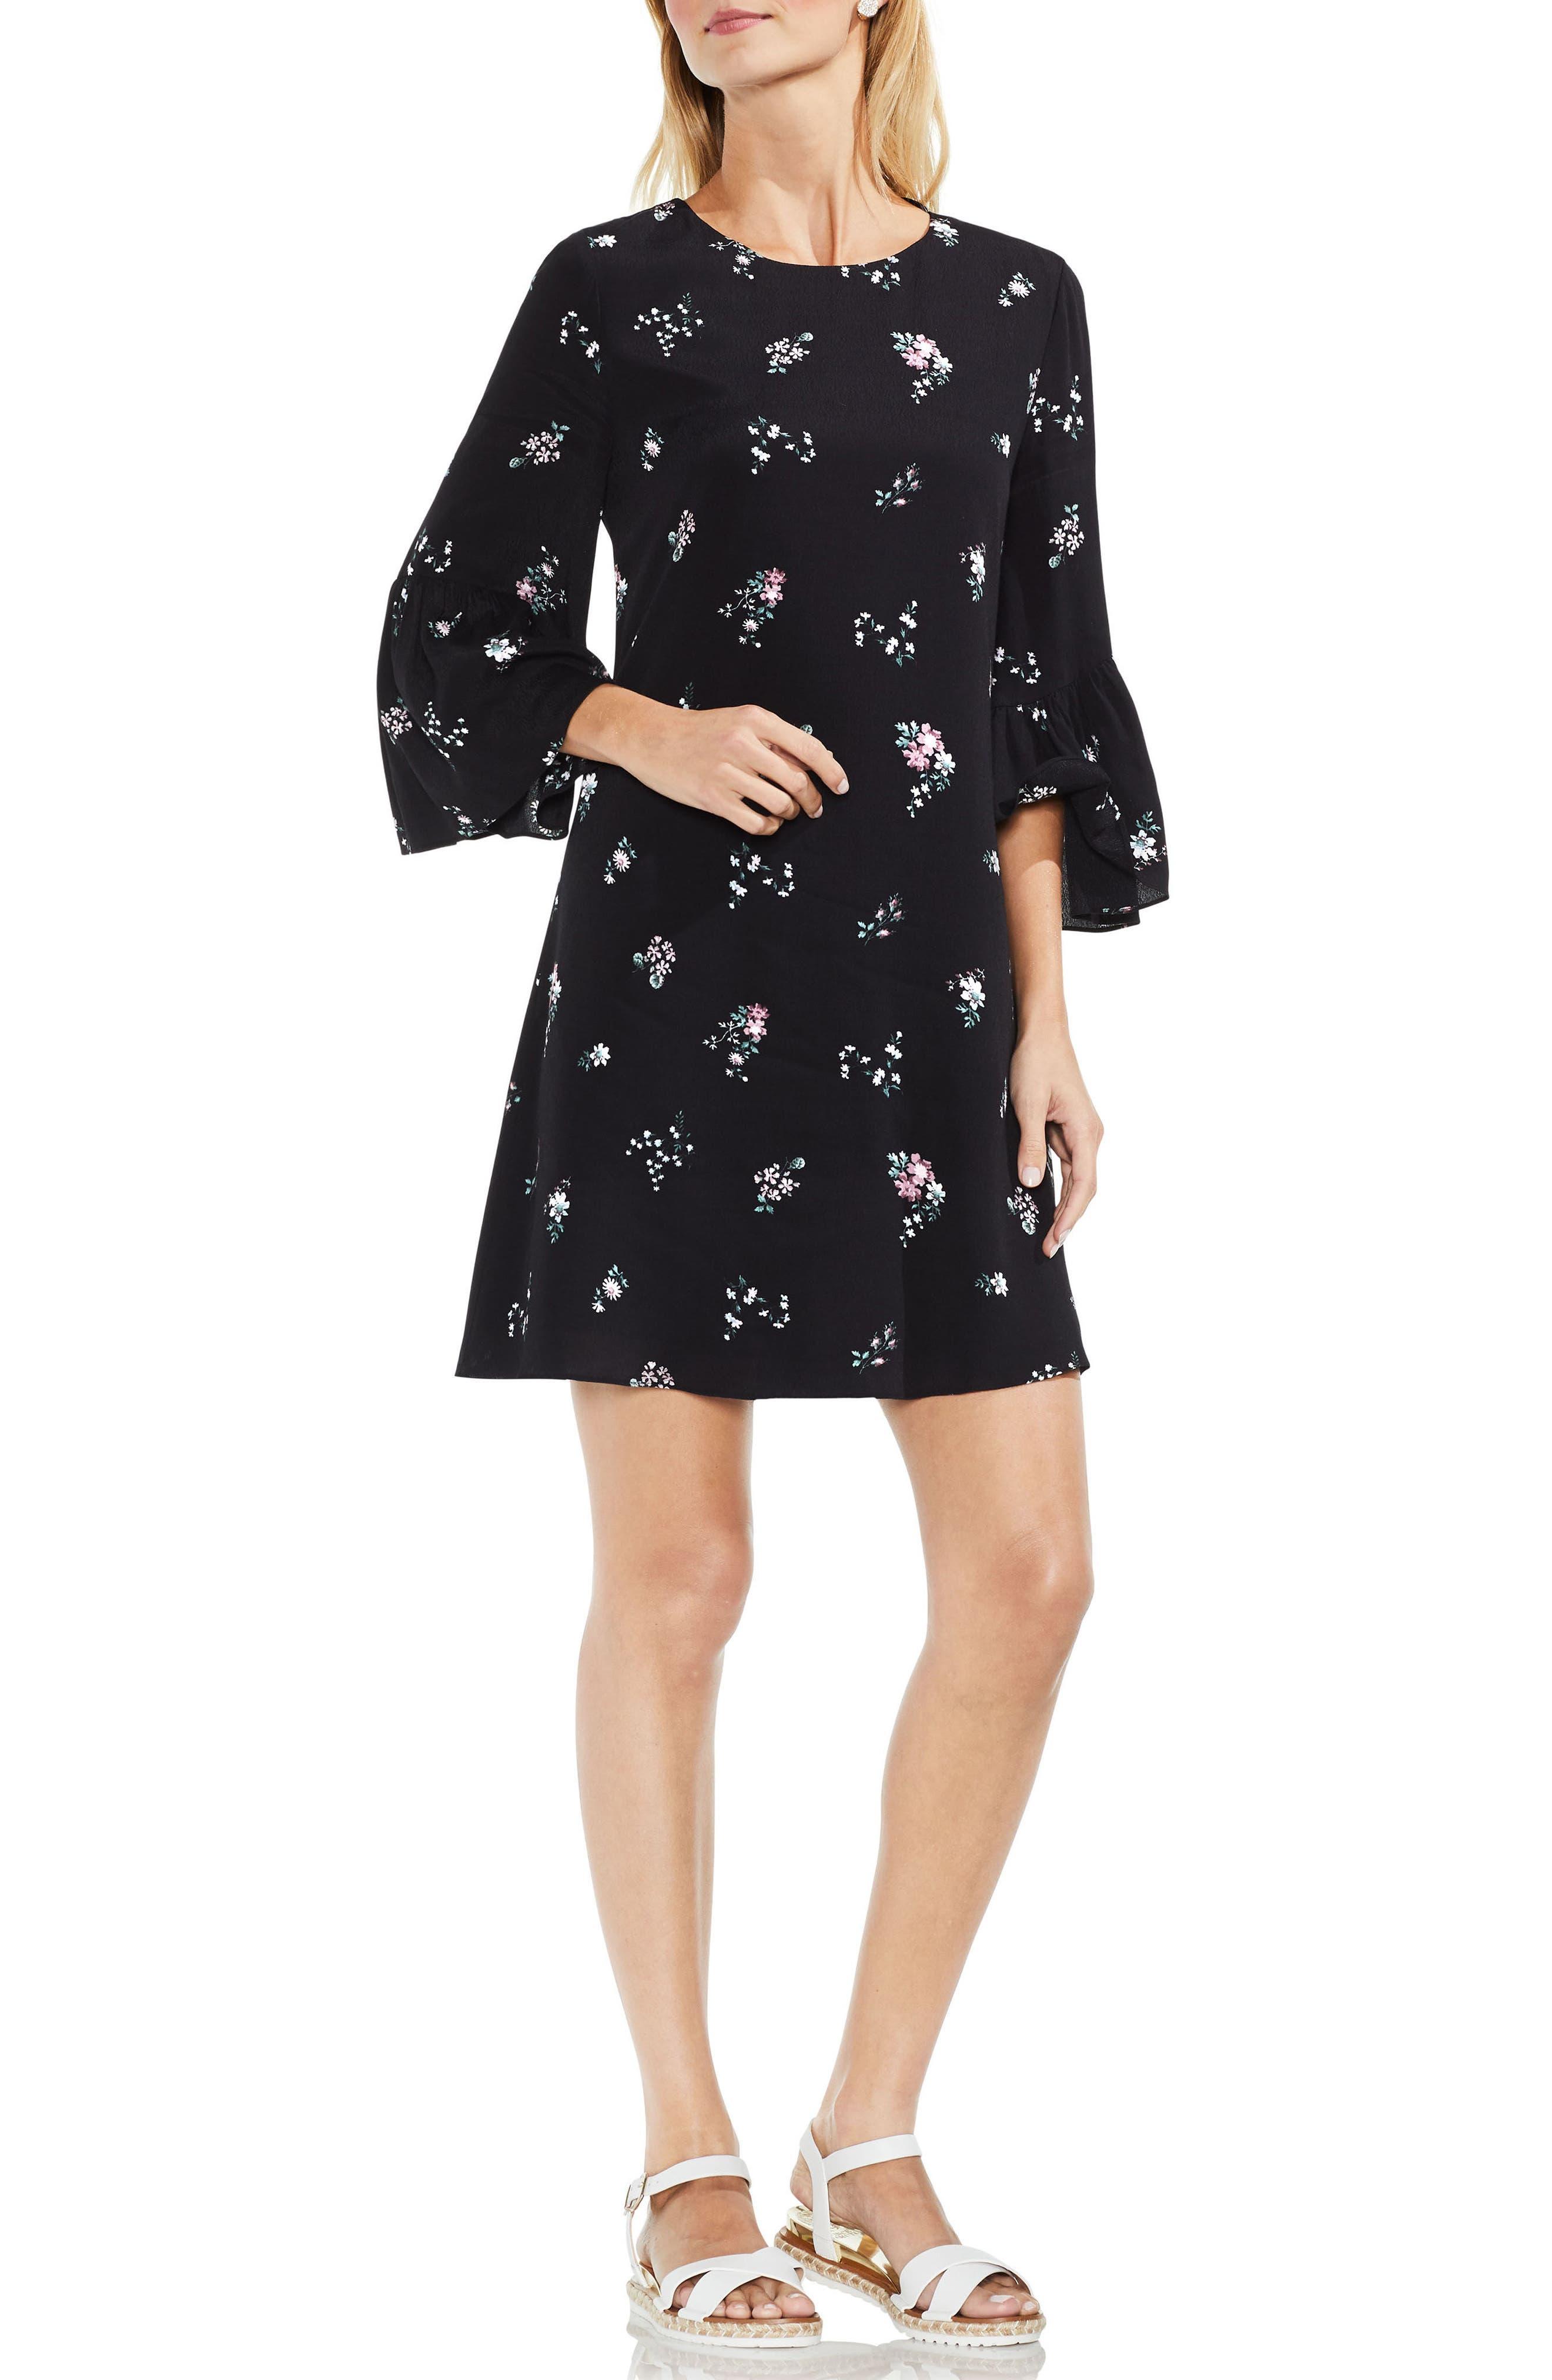 Ruffle Sleeve Floral Dress,                             Alternate thumbnail 3, color,                             Rich Black